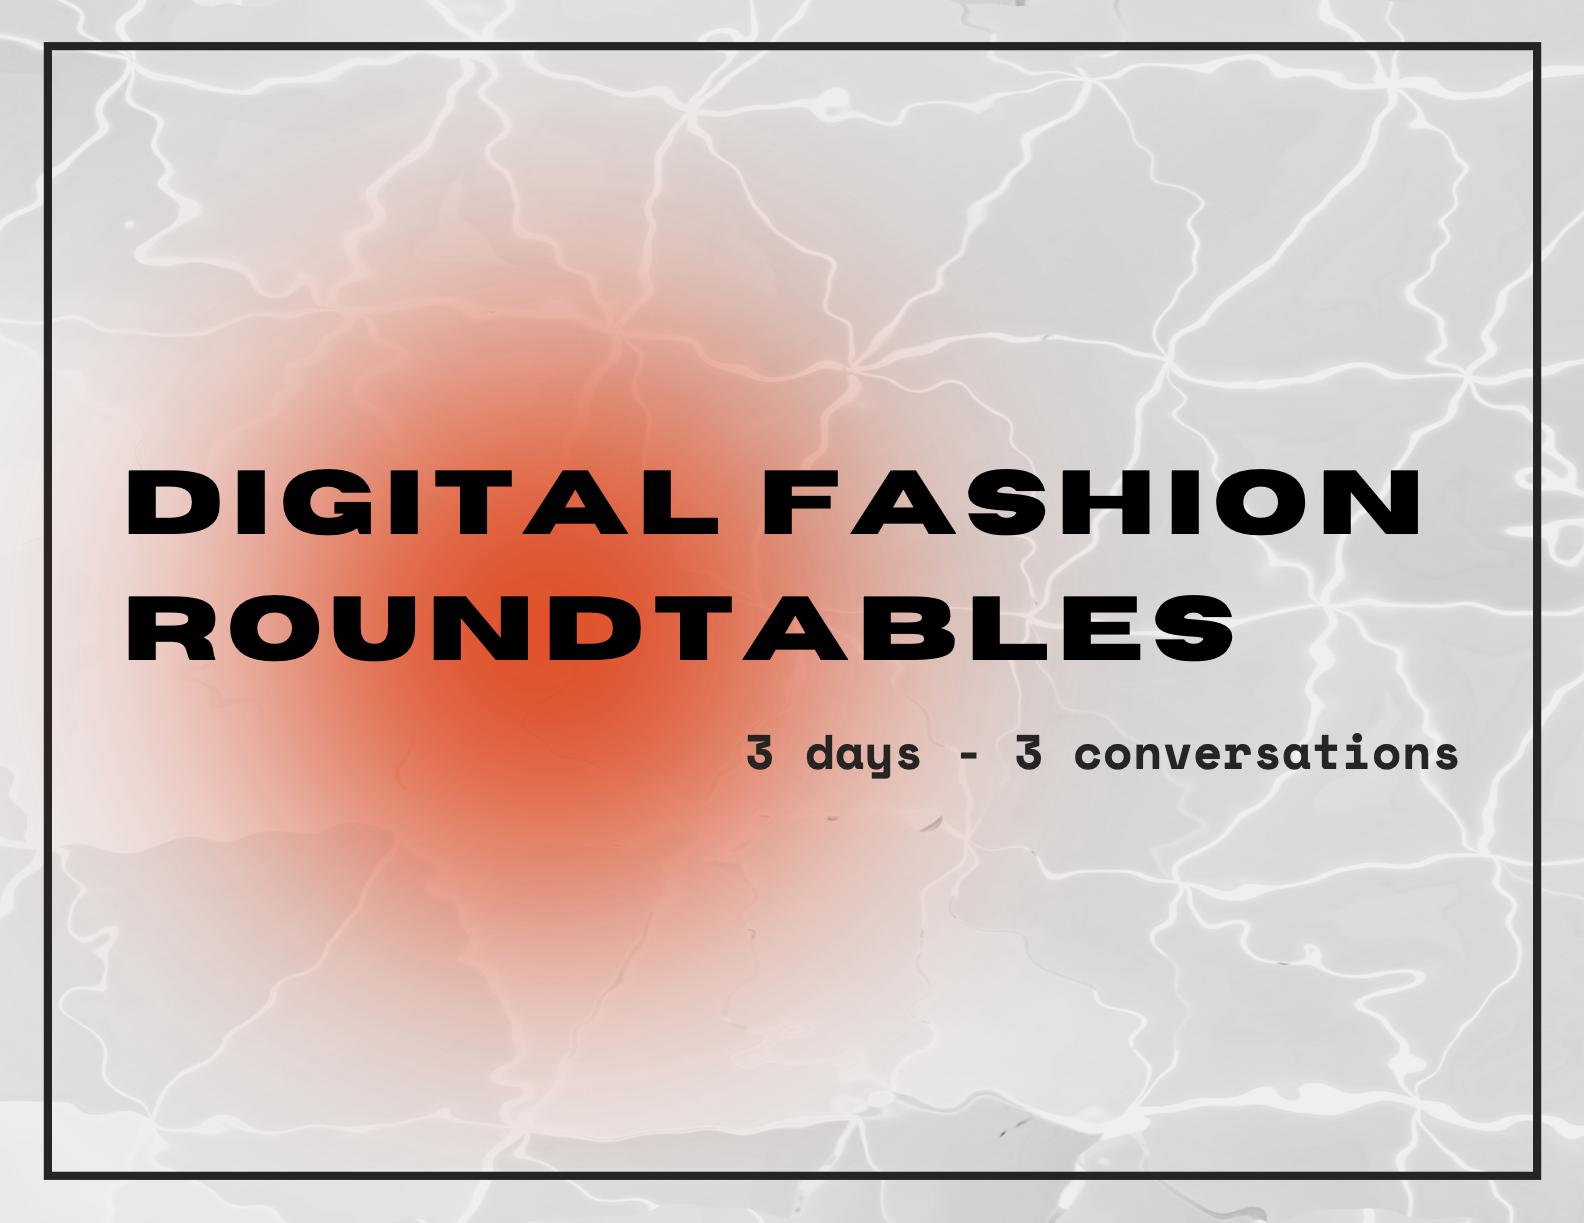 Digital Fashion Roundtables